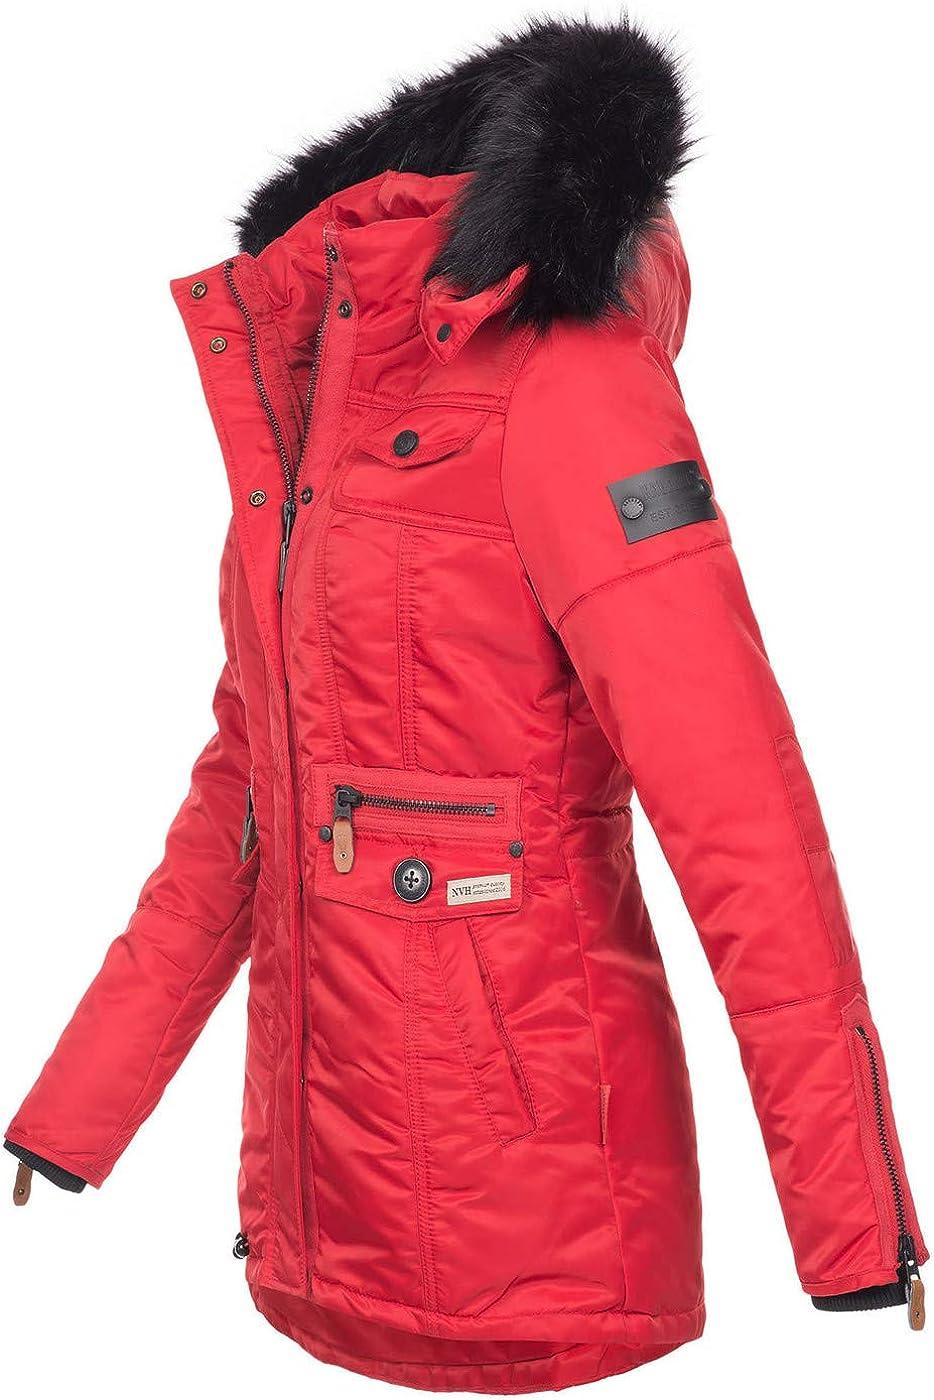 Navahoo Damen Winter Jacke Parka Teddyfell Winterjacke Kunstfell Mantel B615 Rot